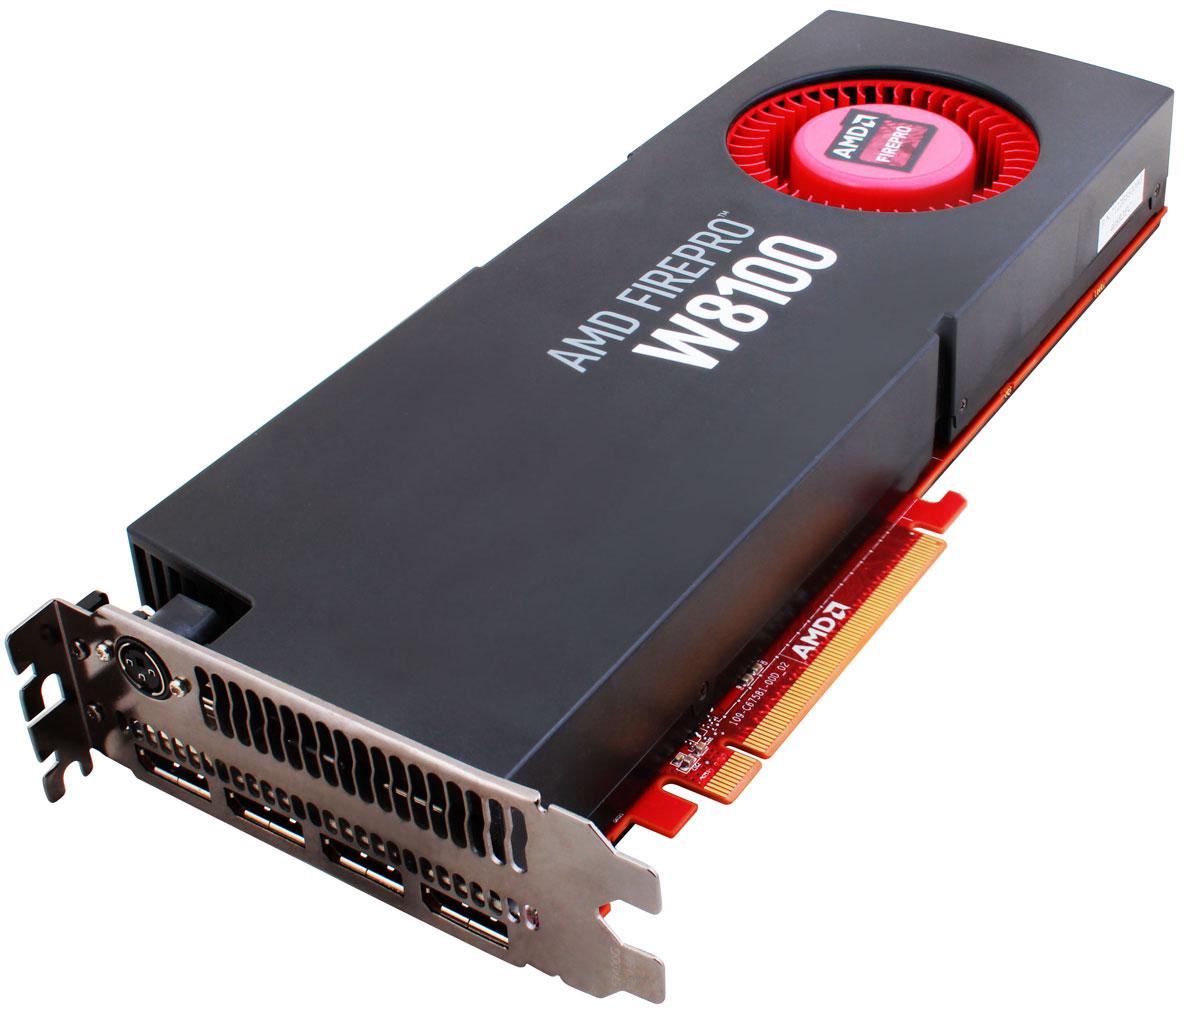 Sapphire AMD FirePro W8100 8GB видеокарта (100-505738/100-505976 AM)